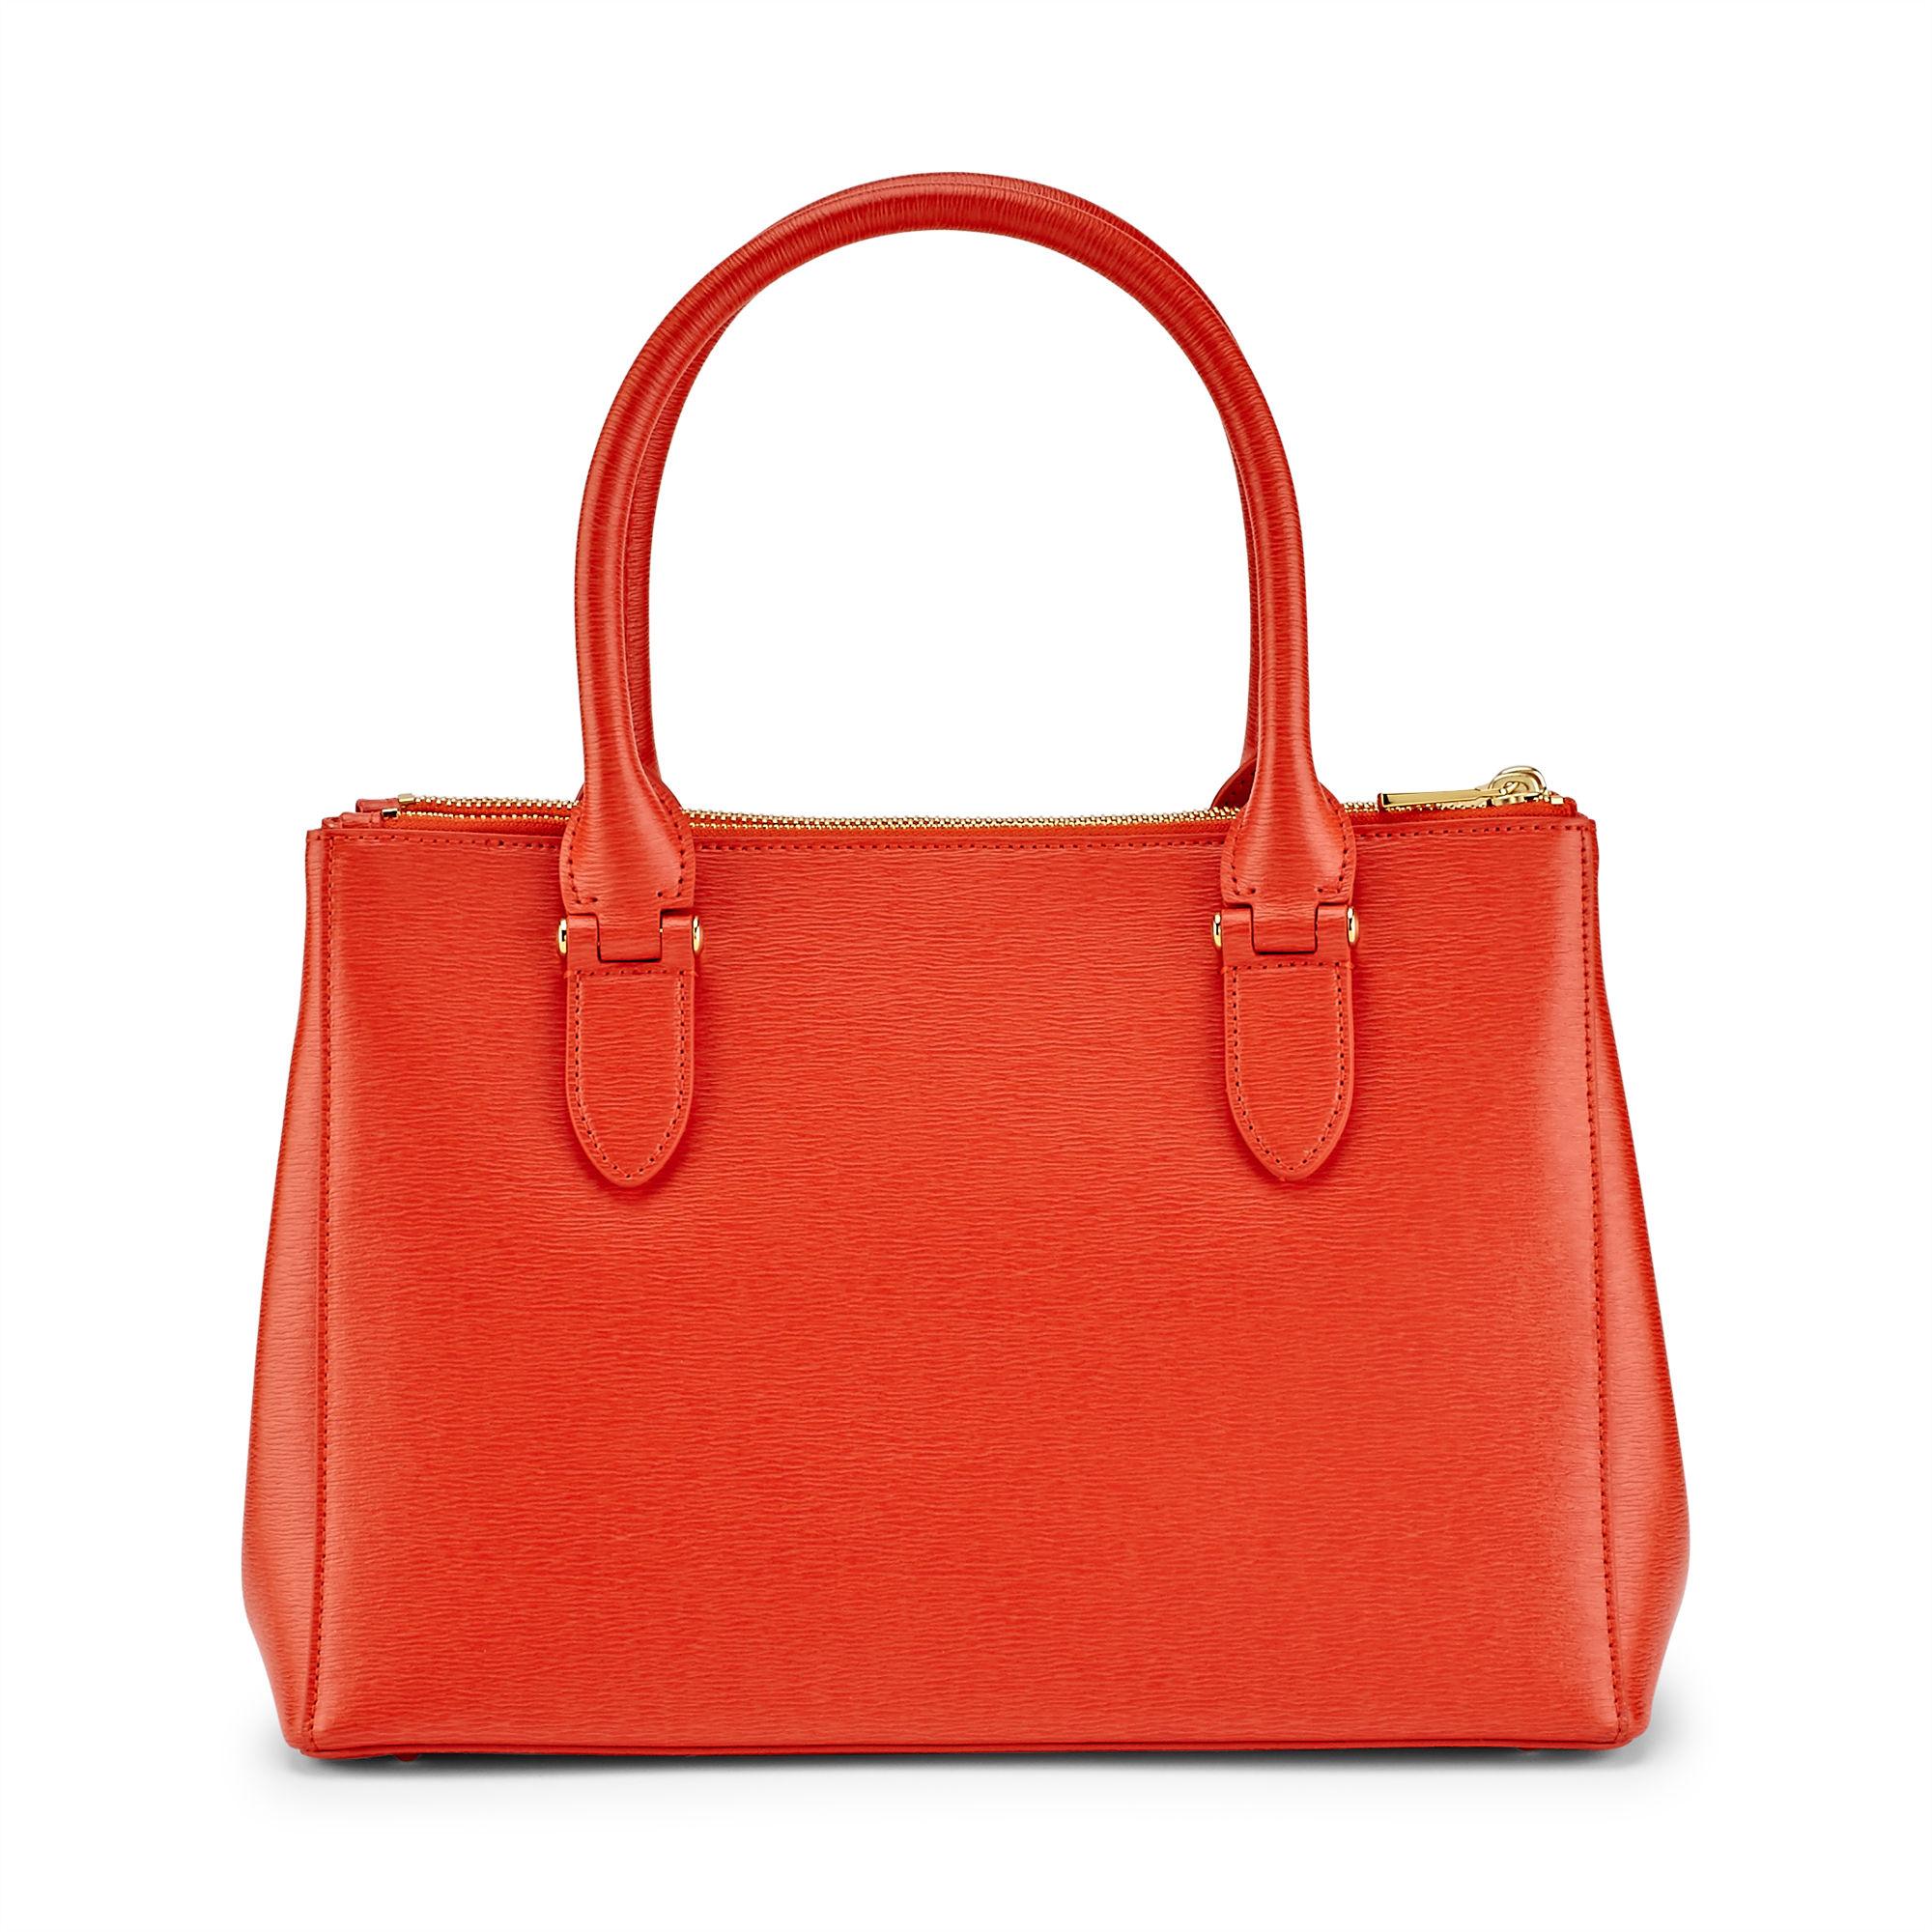 afb3830ae71 Ralph Lauren Newbury Double-zip Shopper in Orange - Lyst